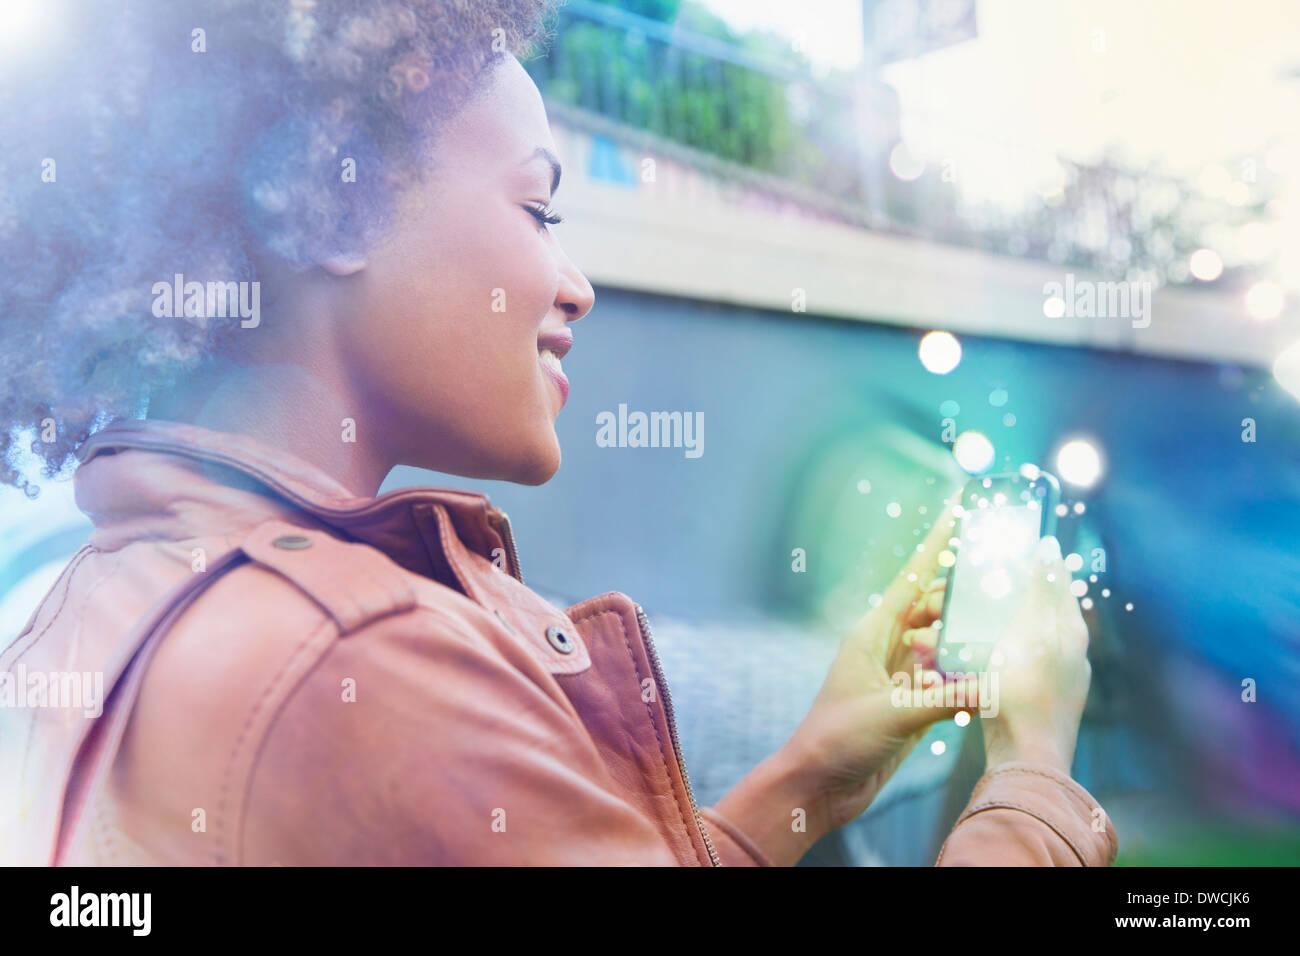 Mujer joven mirando smartphone con luces brillantes saliendo Foto de stock